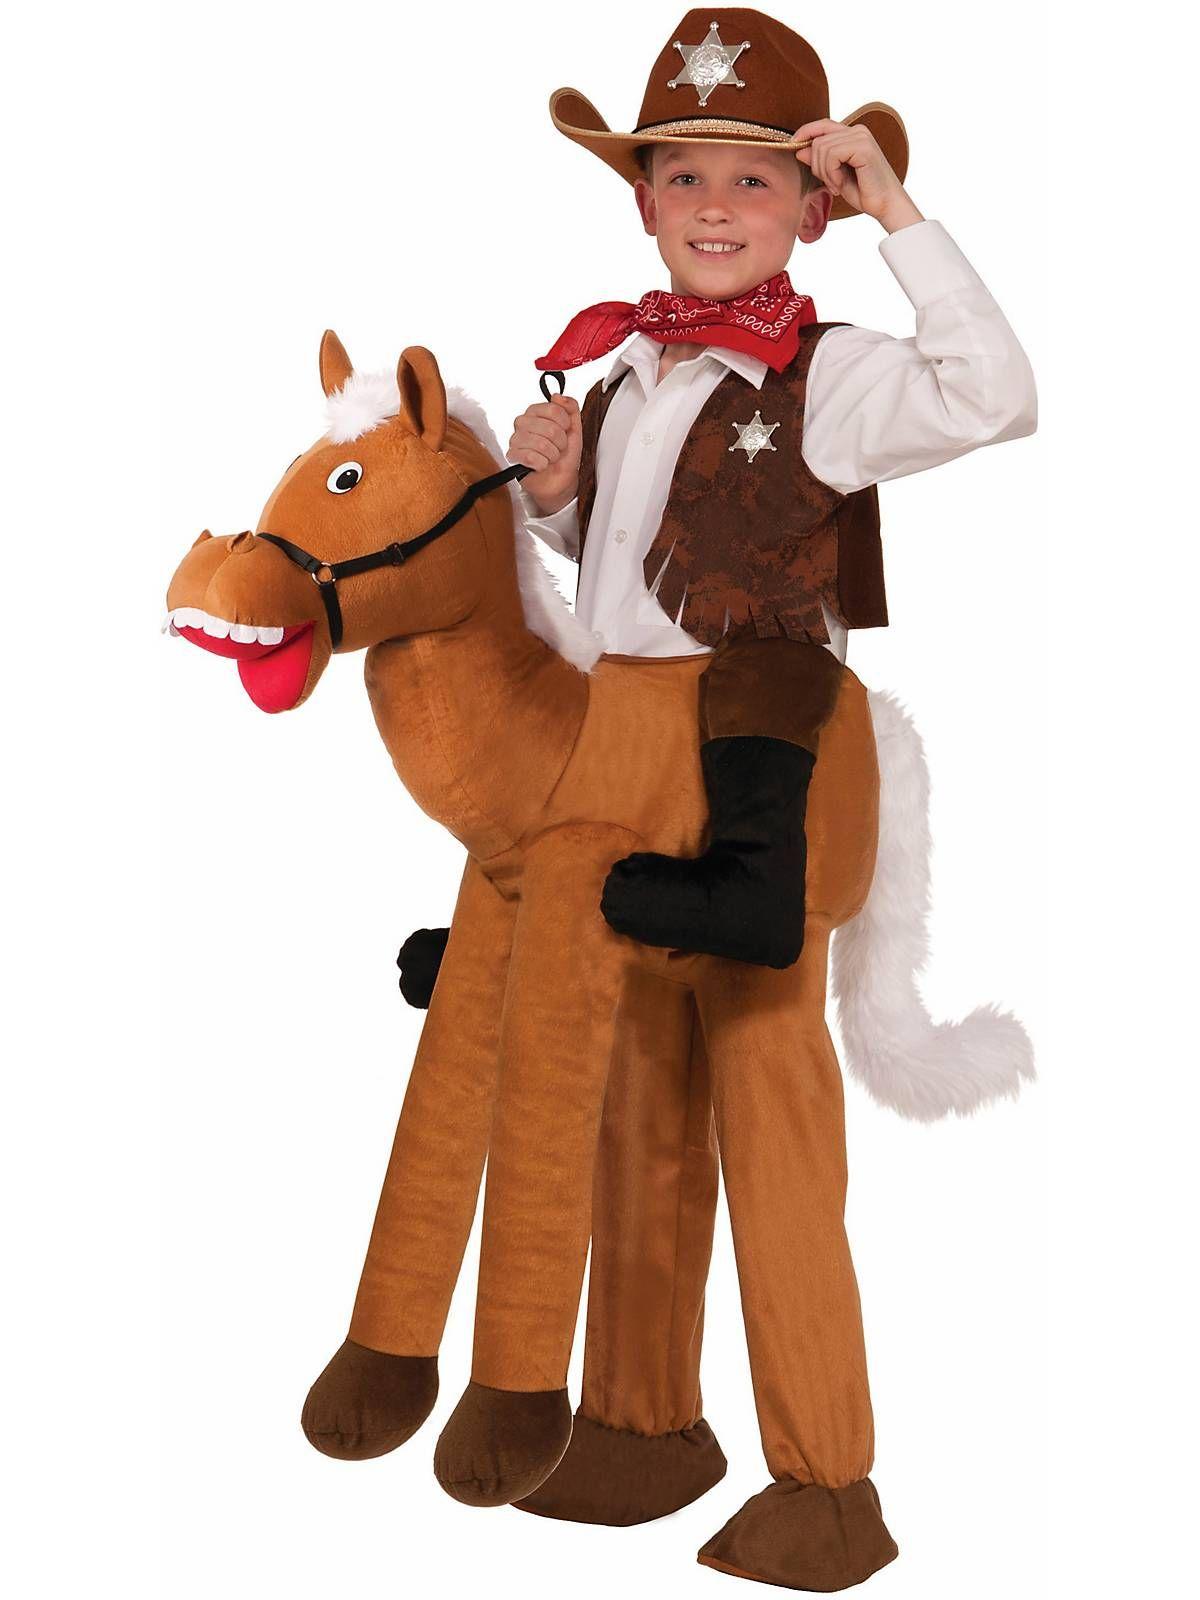 Ride-On Horseback Riding Adult Costume